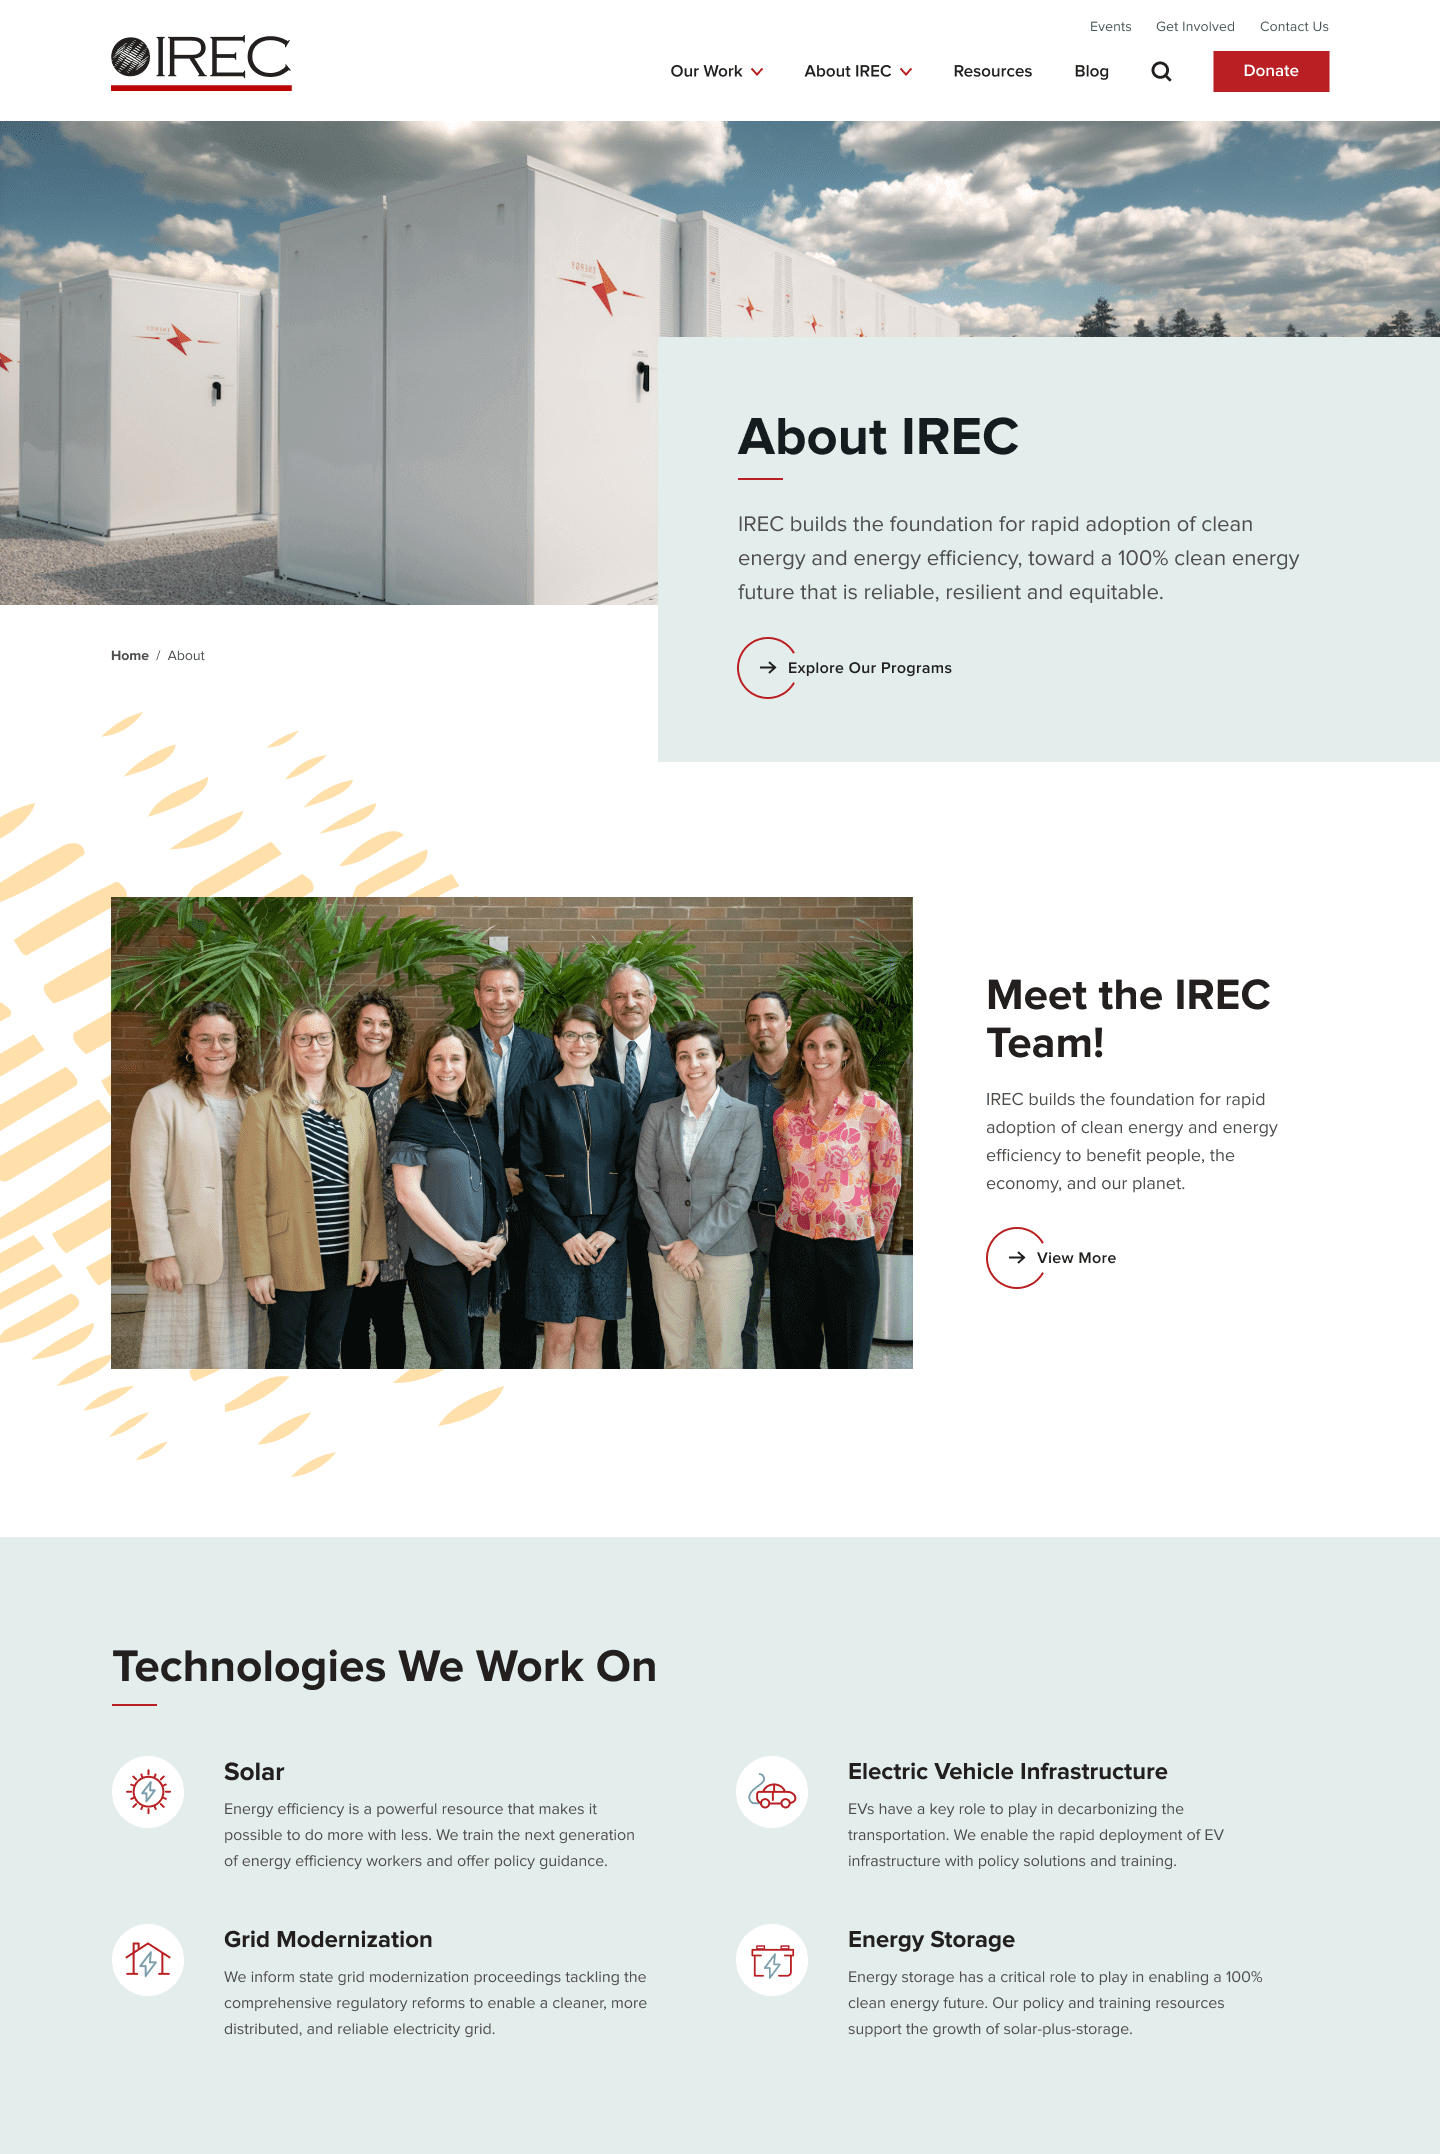 IREC landing page